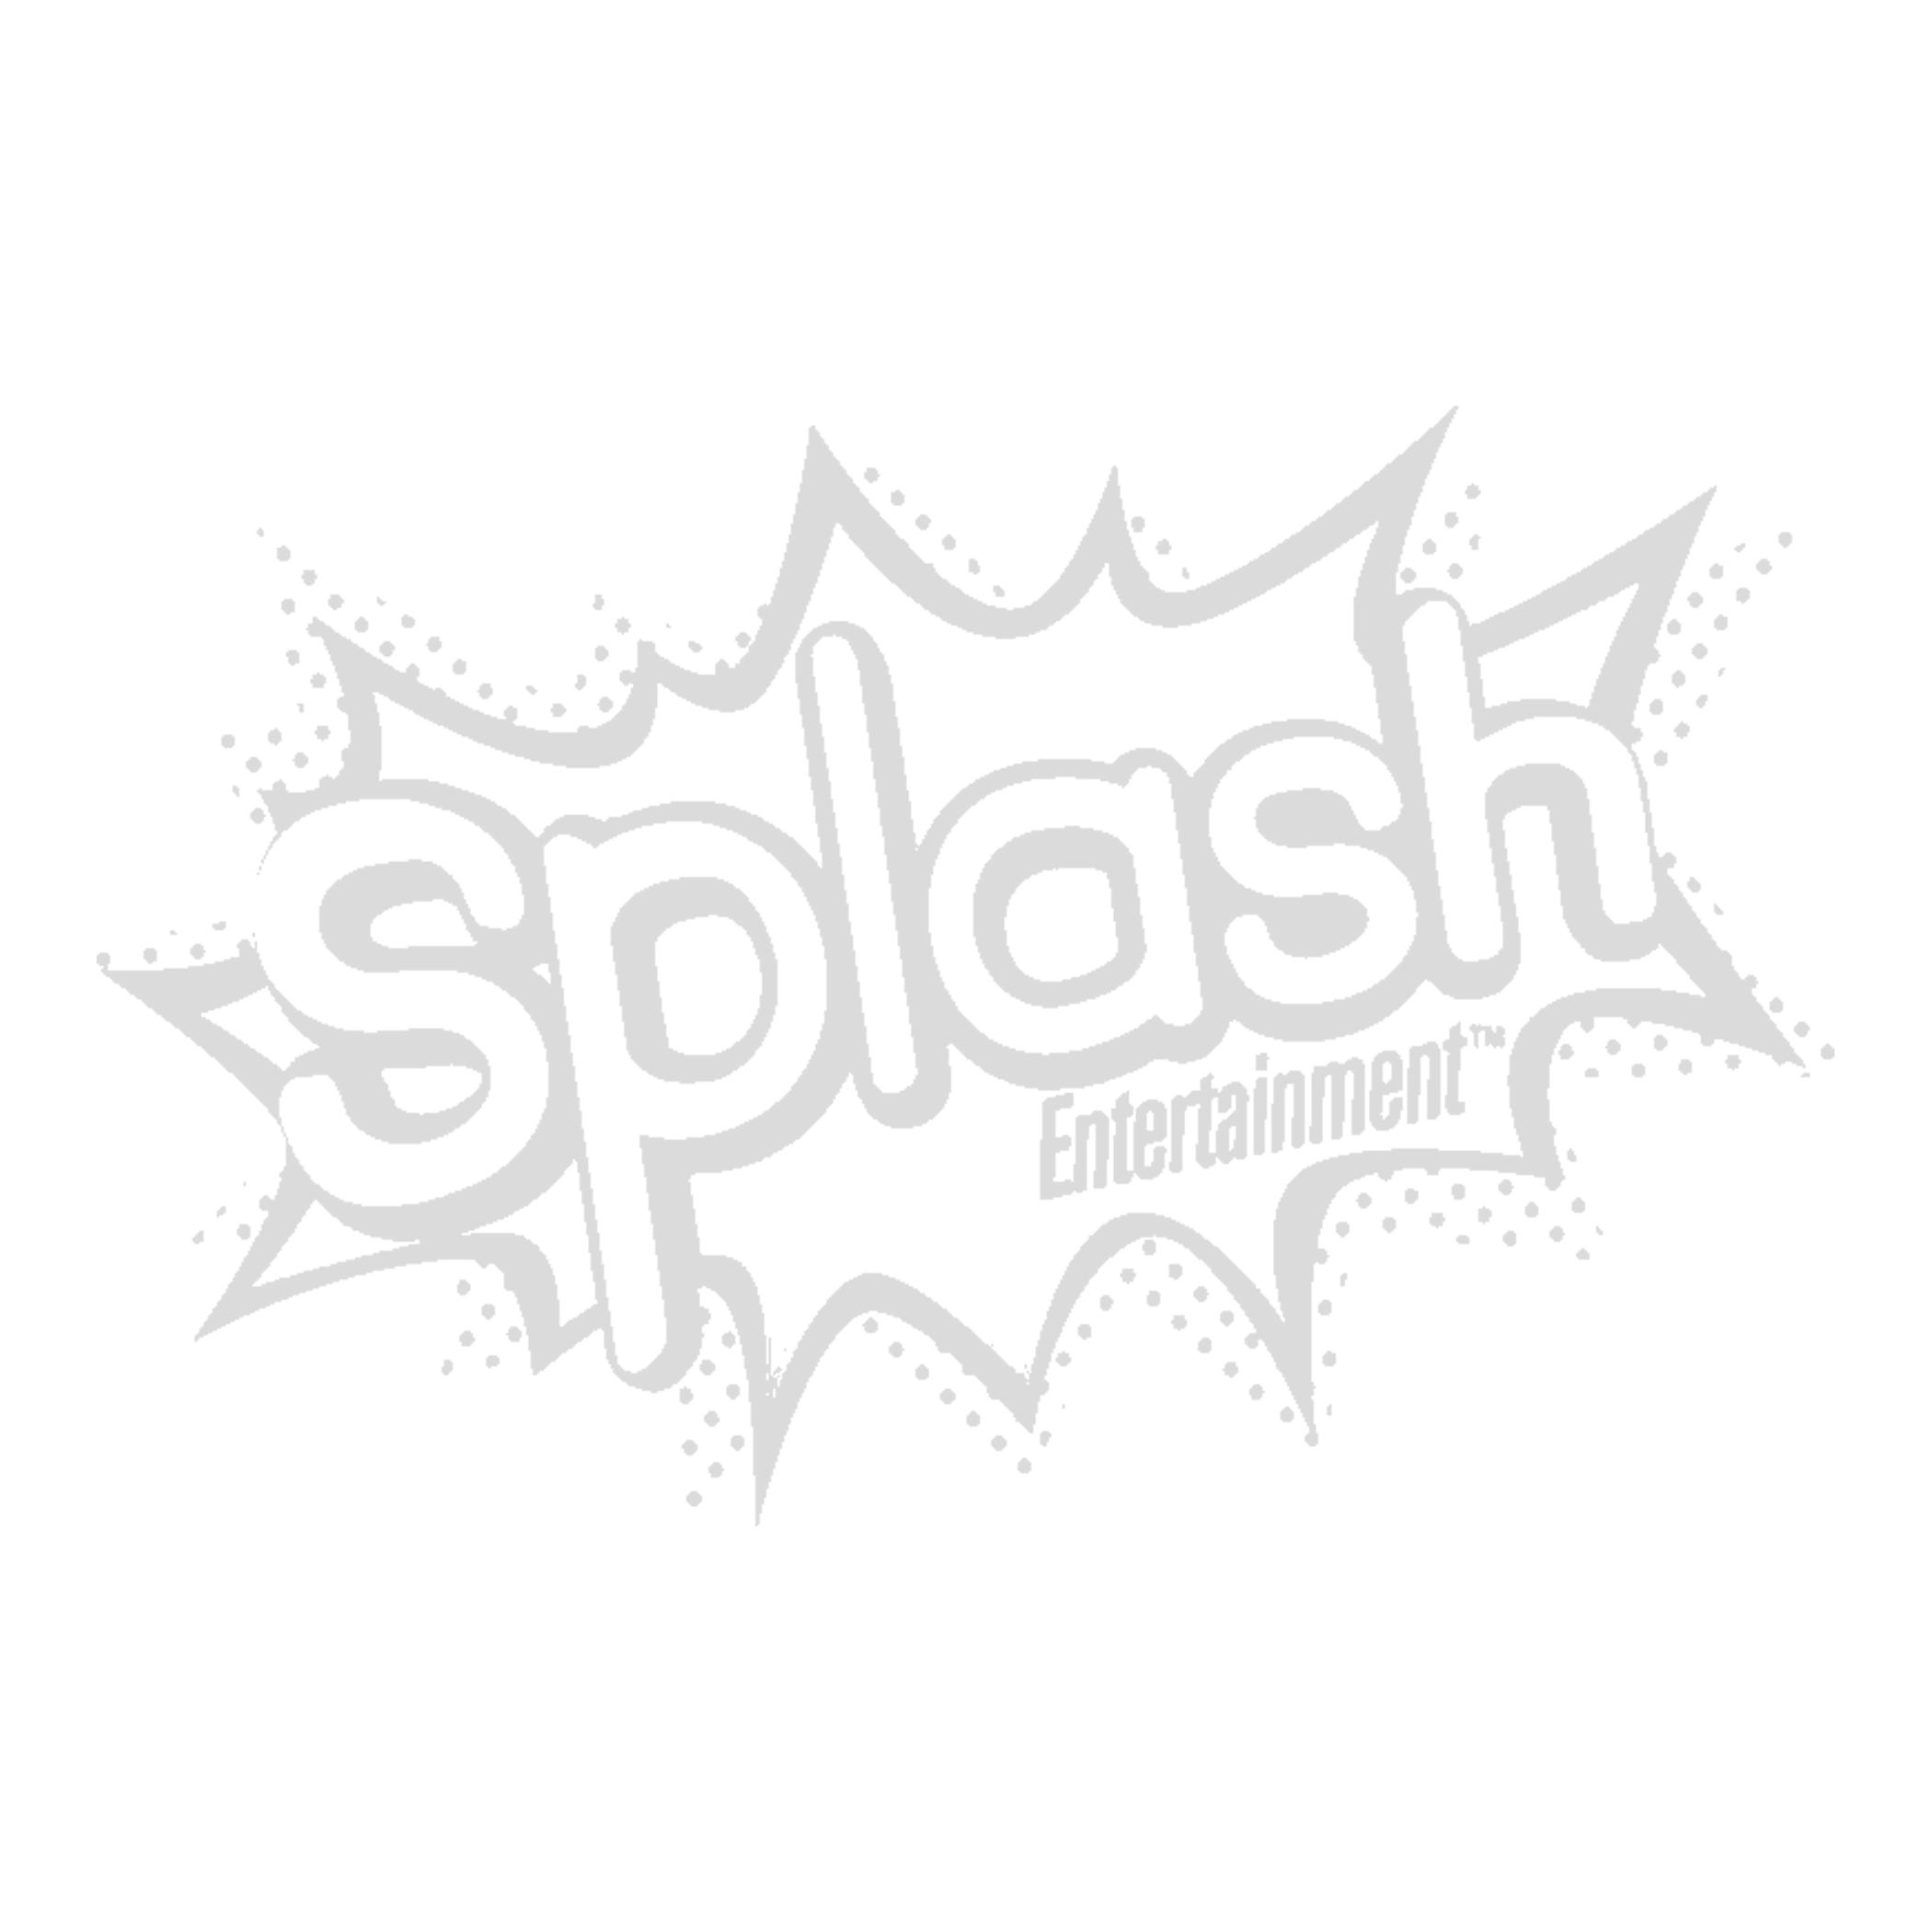 SPLASH_GRAY.png